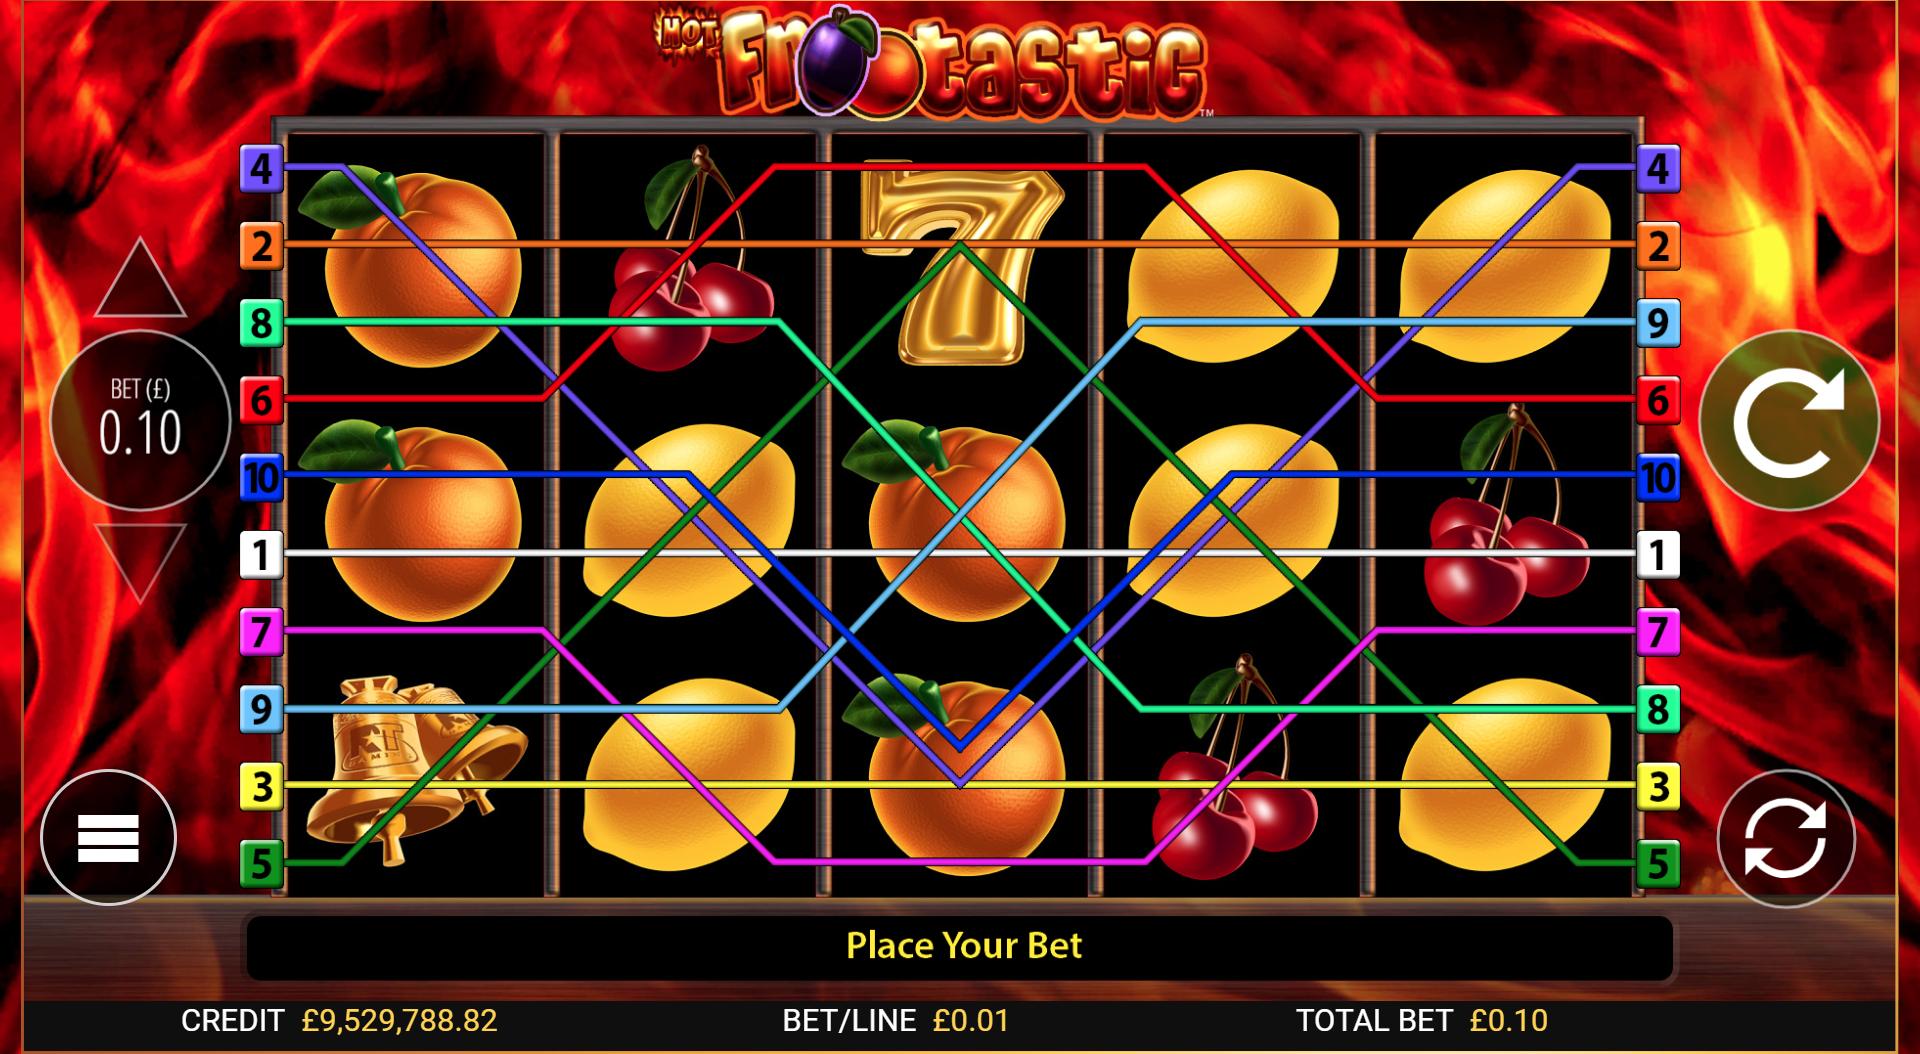 ScrnShot1-Base-game-4